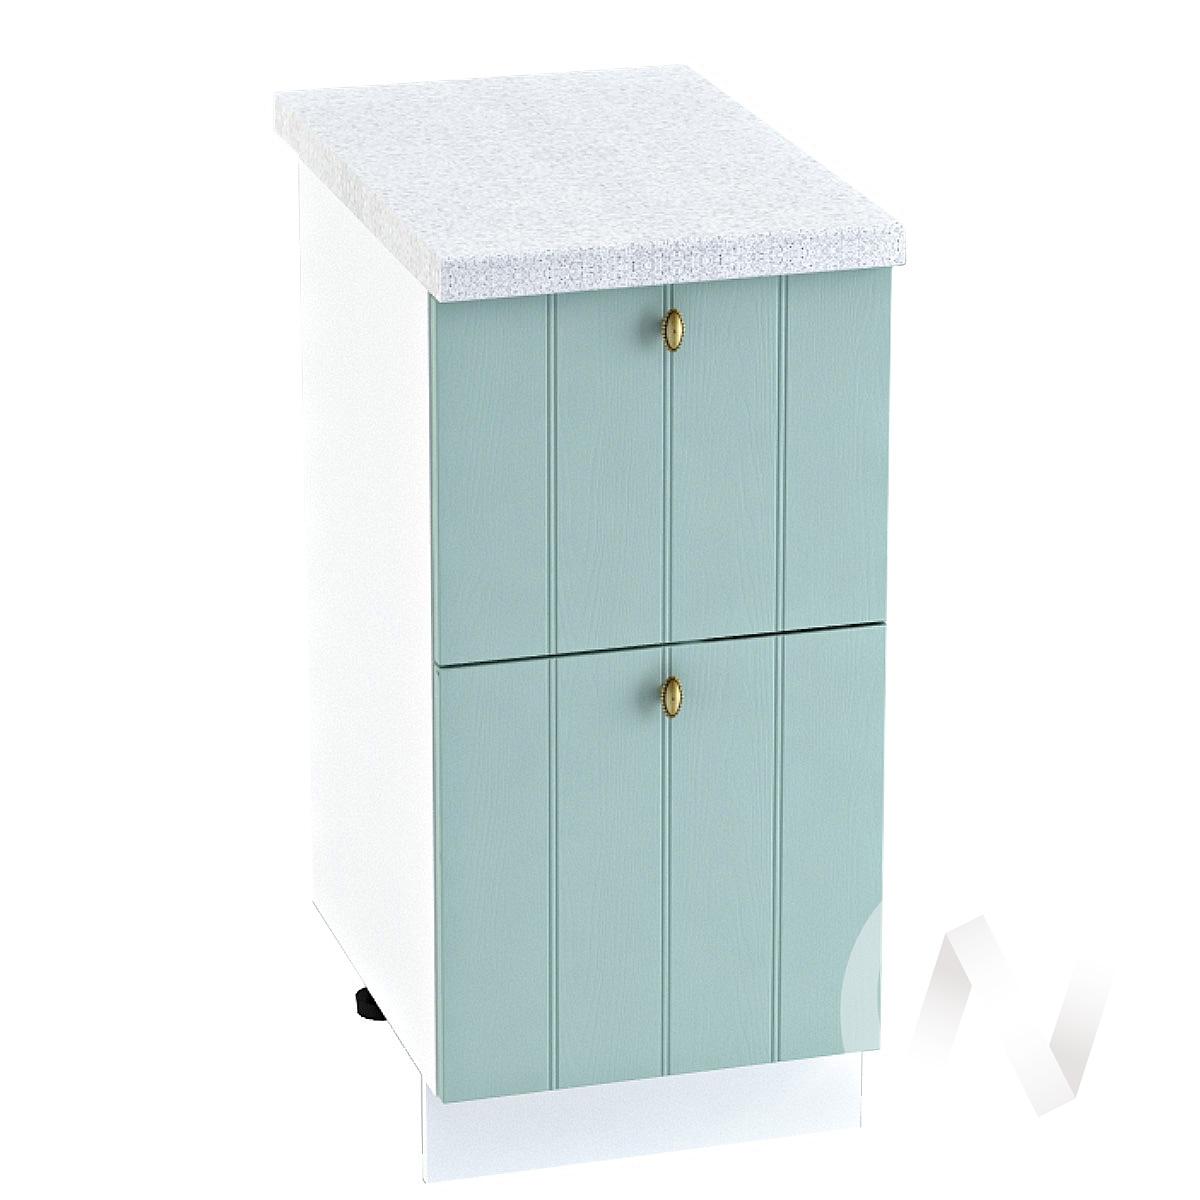 "Кухня ""Прованс"": Шкаф нижний с 2-мя ящиками 400, ШН2Я 400 (голубой/корпус белый)"